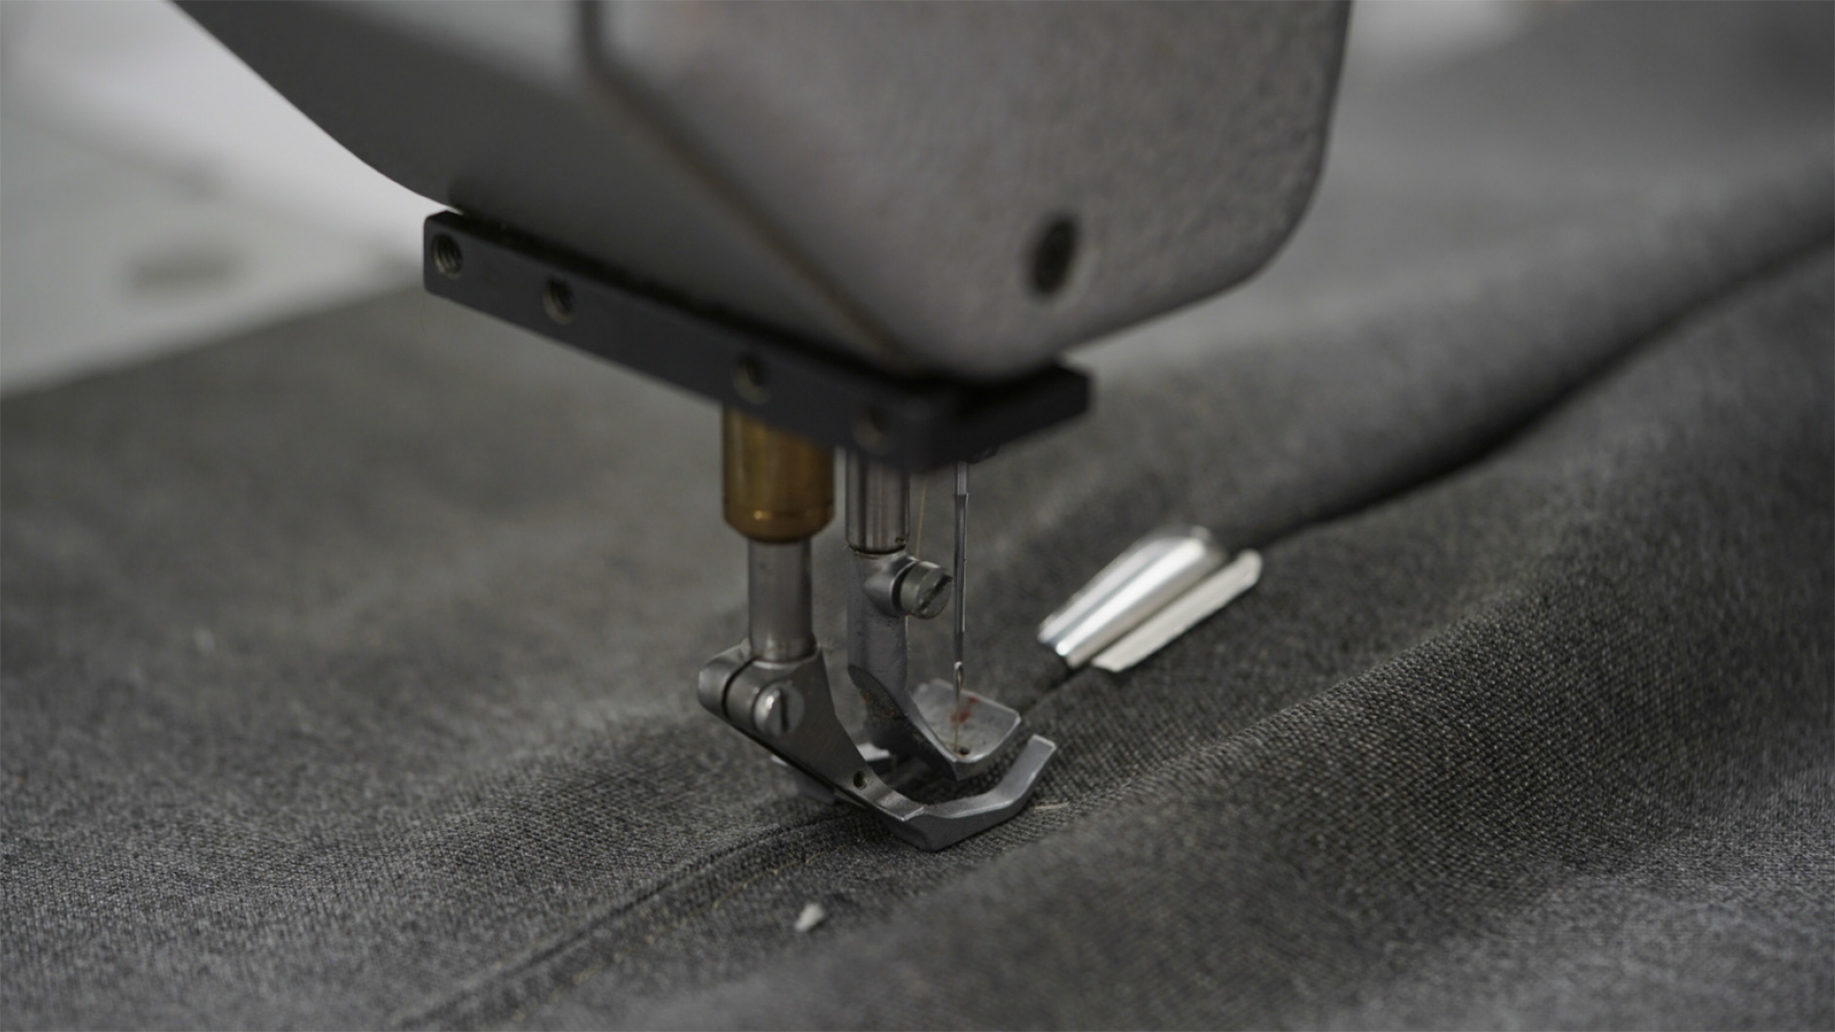 https://www.schoenhuberfranchi.it/wp-content/uploads/2021/07/mood-materials-01-textiles.jpg